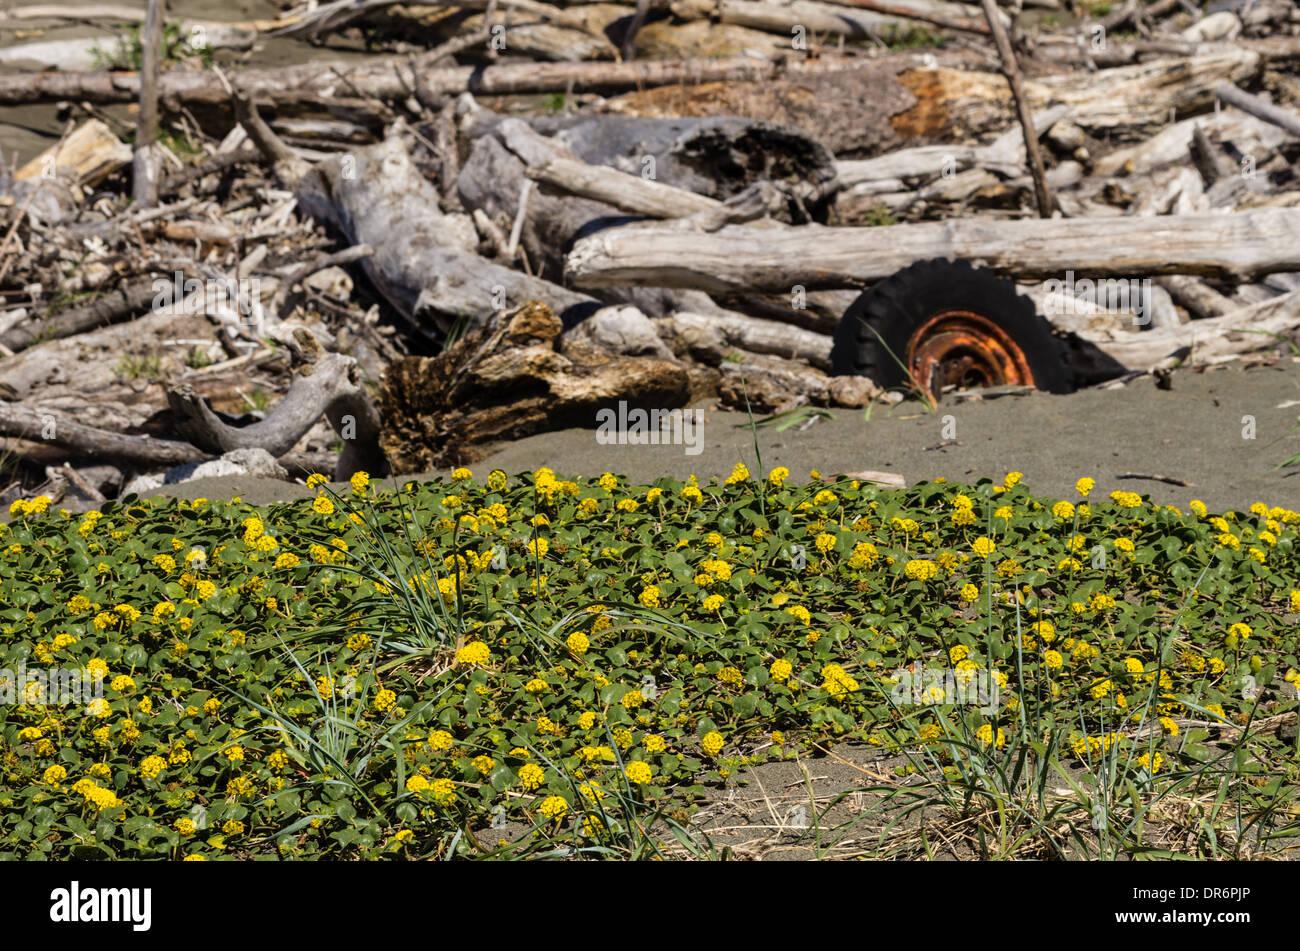 Abronia latifolia growing on the Oregon coast near trash dumped on the beach. Brookings, Oregon - Stock Image